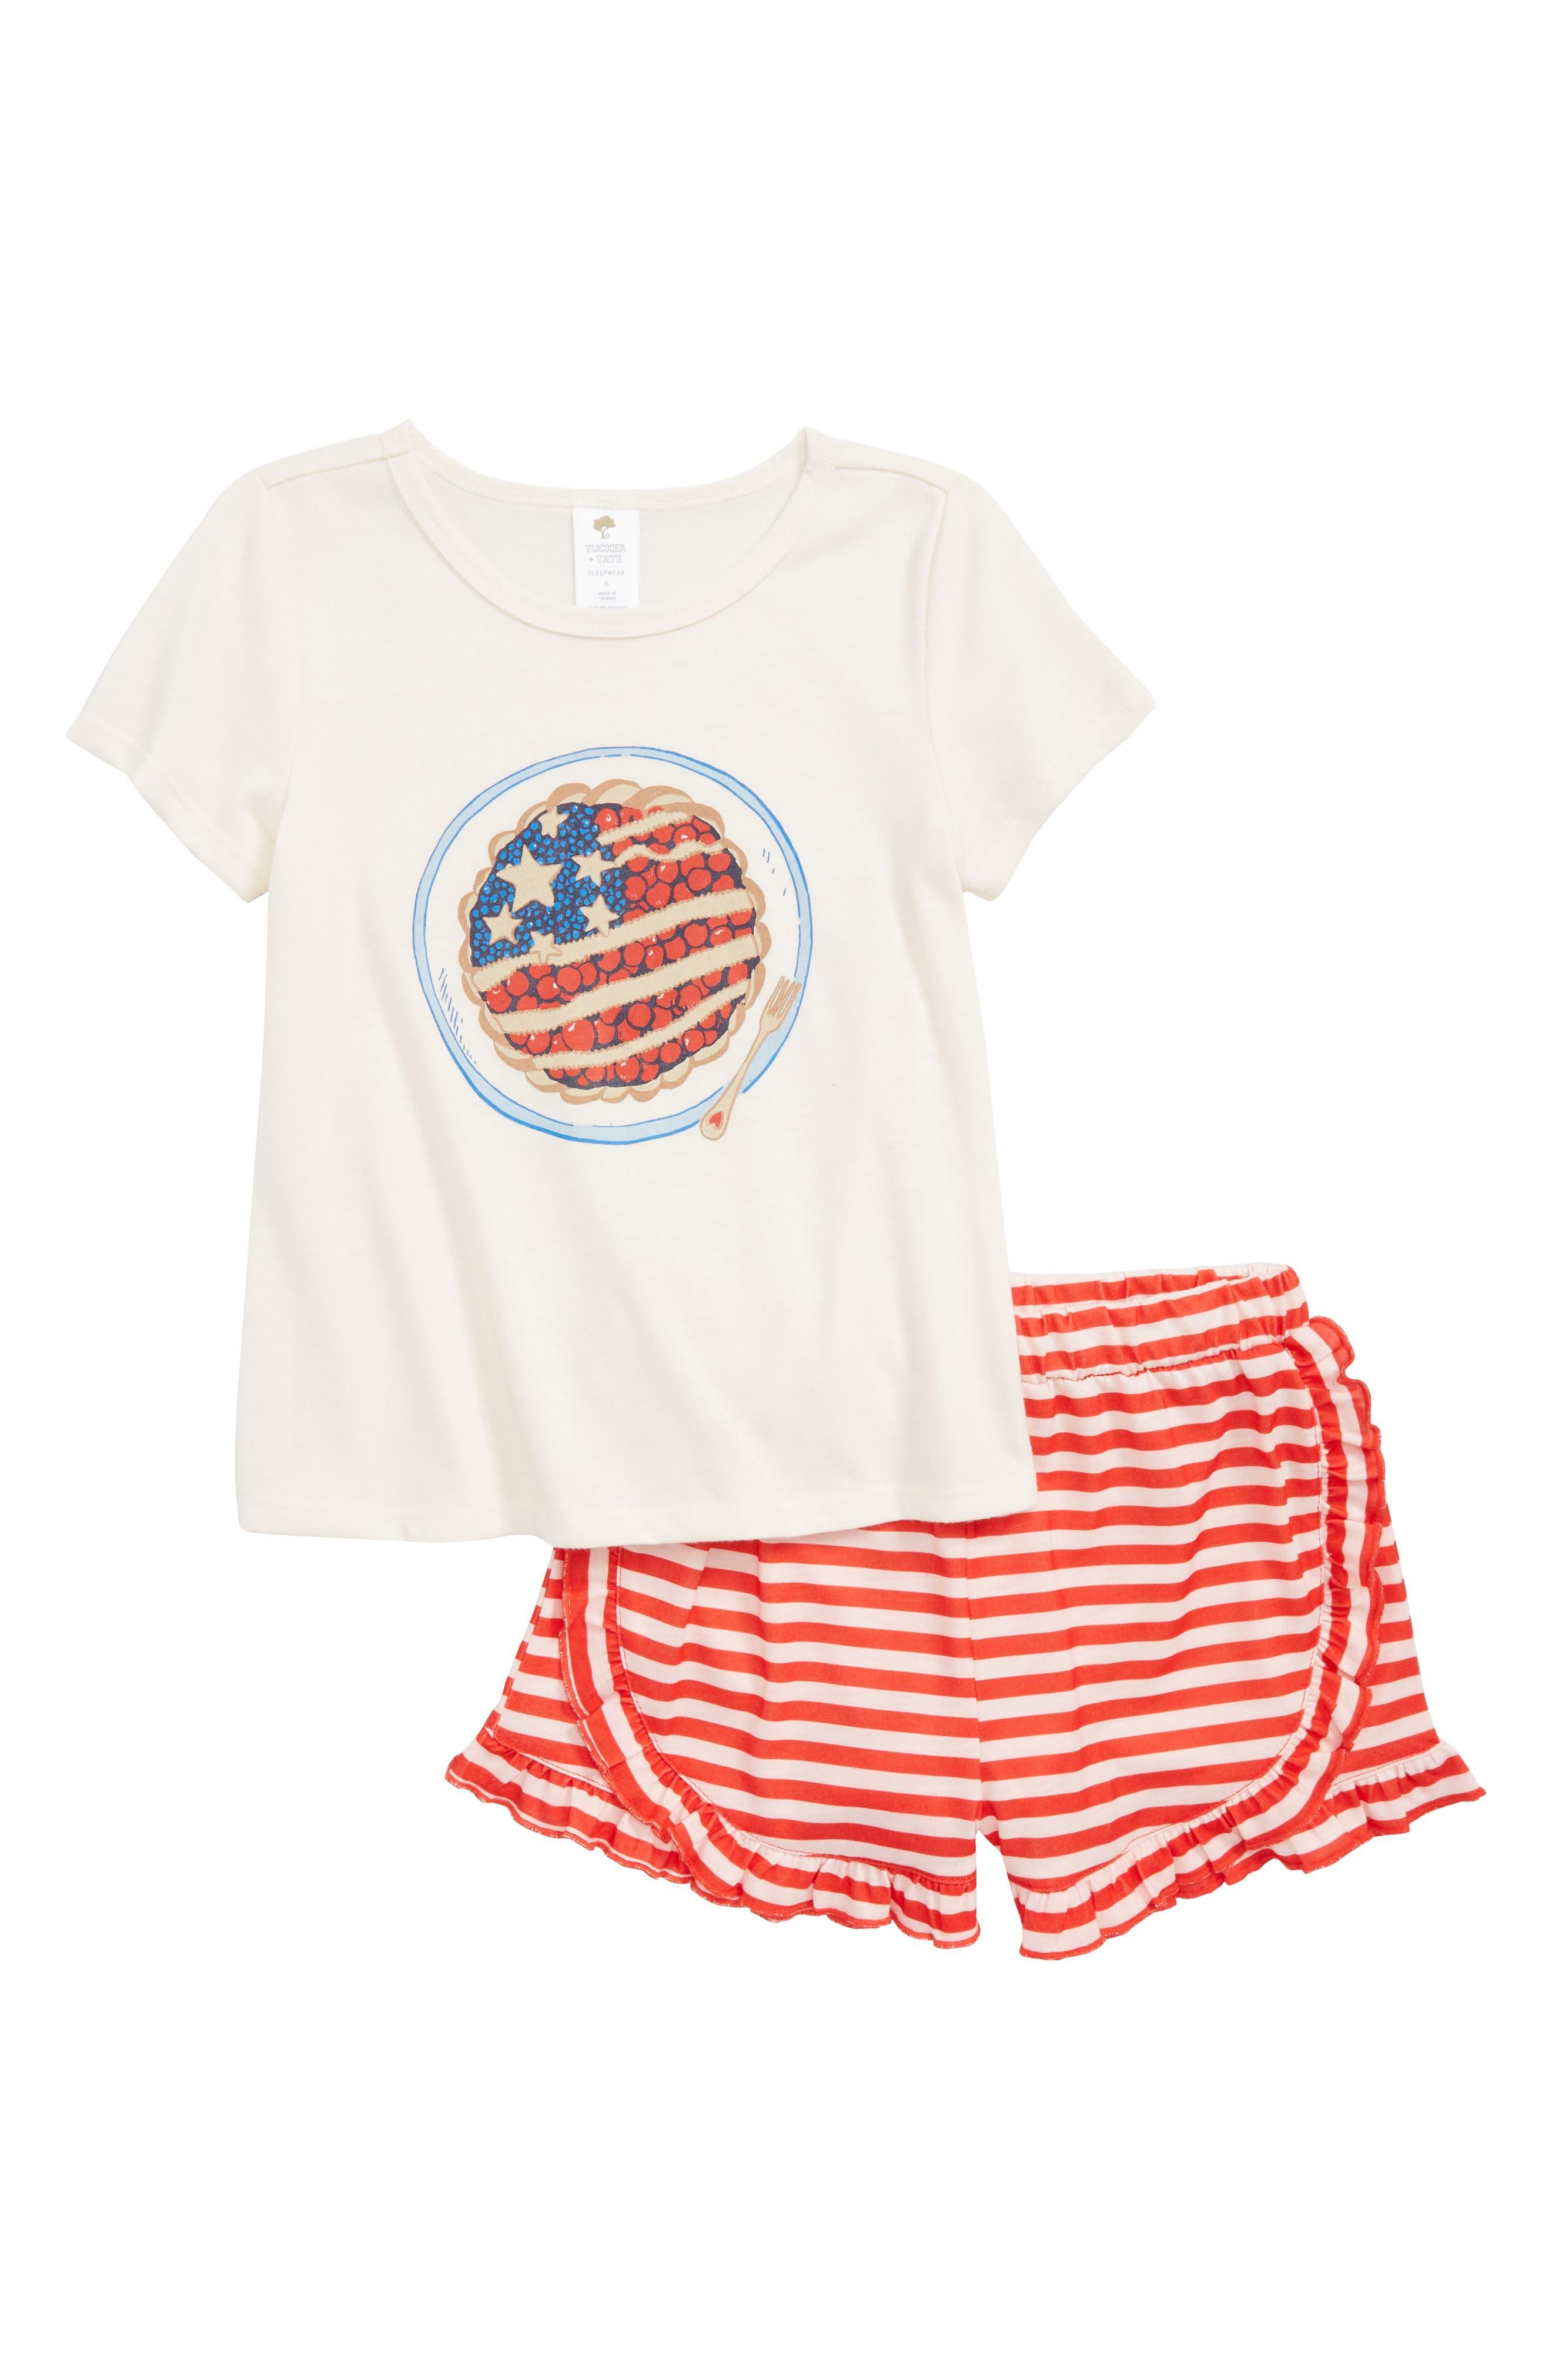 Two-Piece Pajamas,                         Main,                         color, Ivory Egret Cherry Pie